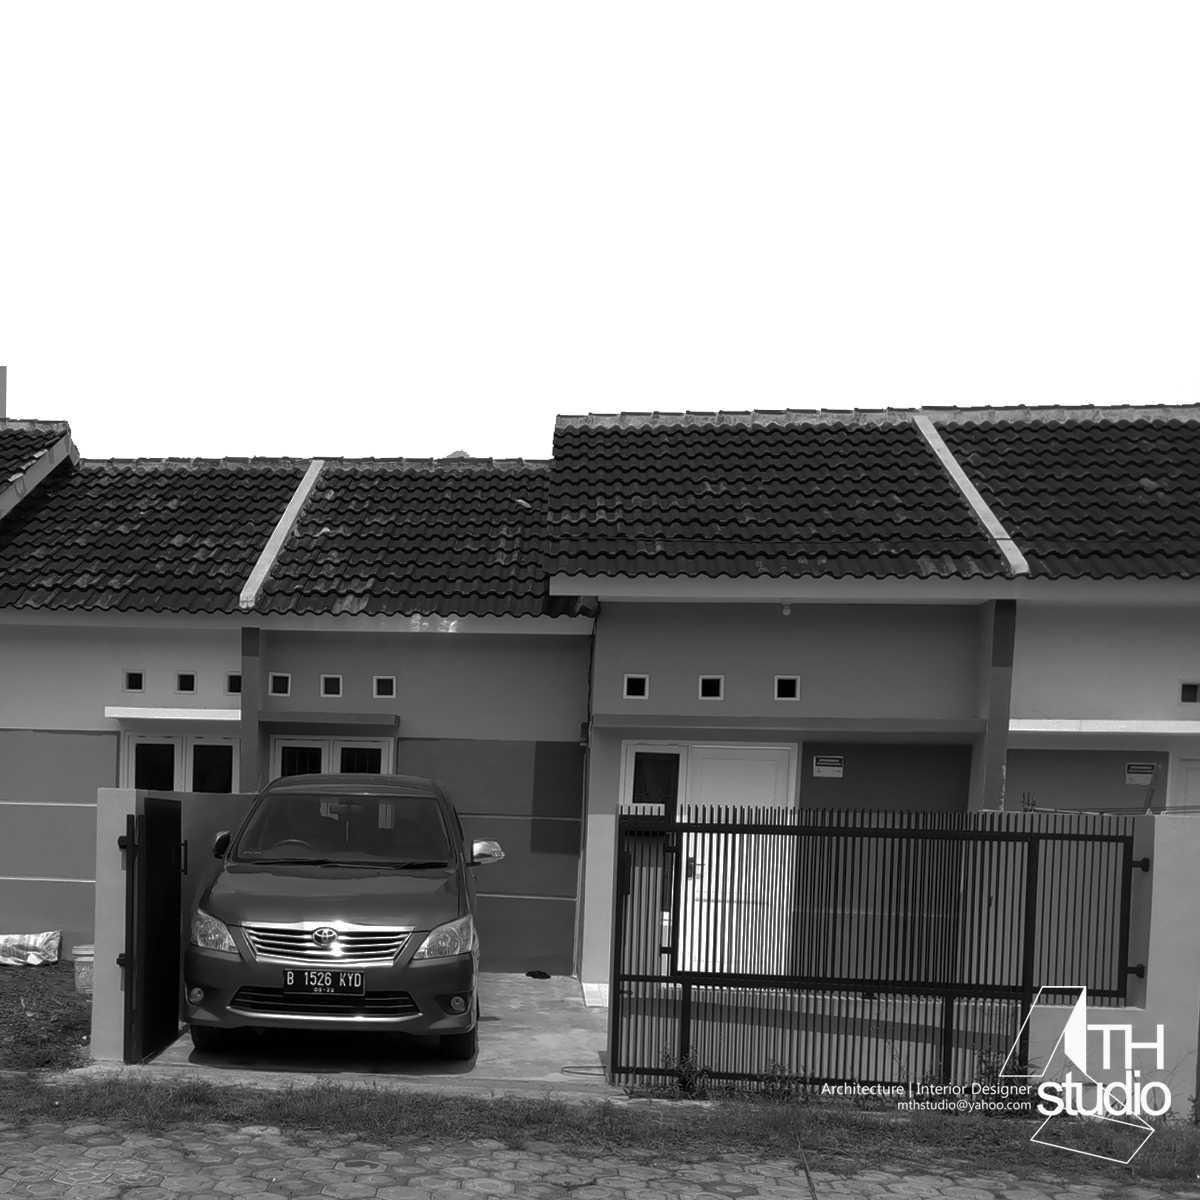 Mth Studio Rumah Tumbuh Sederhana Kabupaten Cianjur, Jawa Barat, Indonesia Kabupaten Cianjur, Jawa Barat, Indonesia Front View Minimalist  40263